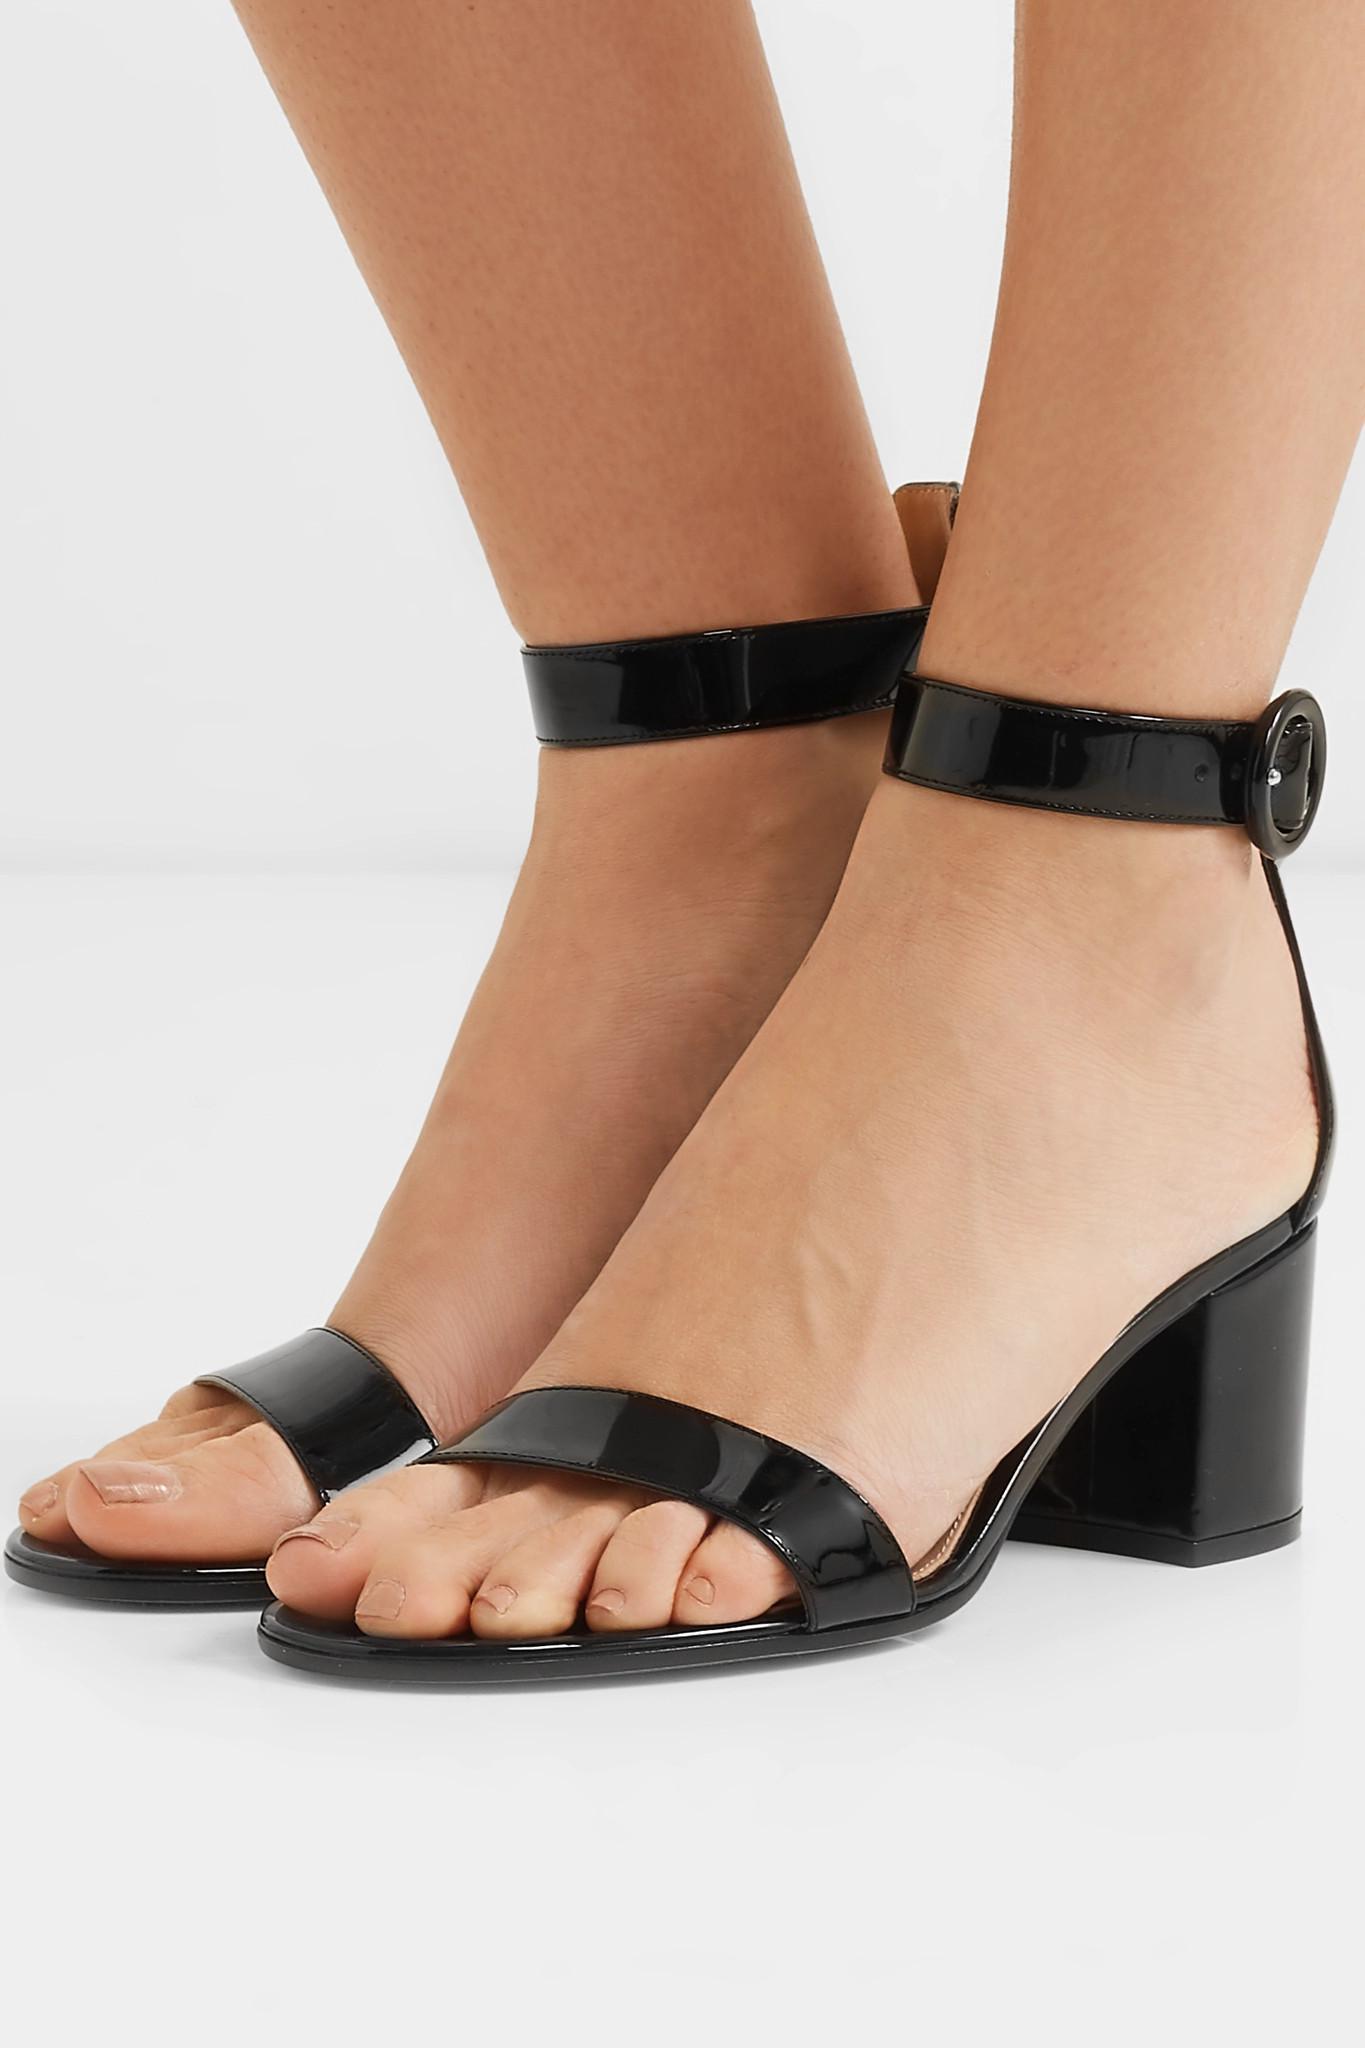 b113d77b07f8 Gianvito Rossi - Black Versilia 60 Patent-leather Sandals - Lyst. View  fullscreen